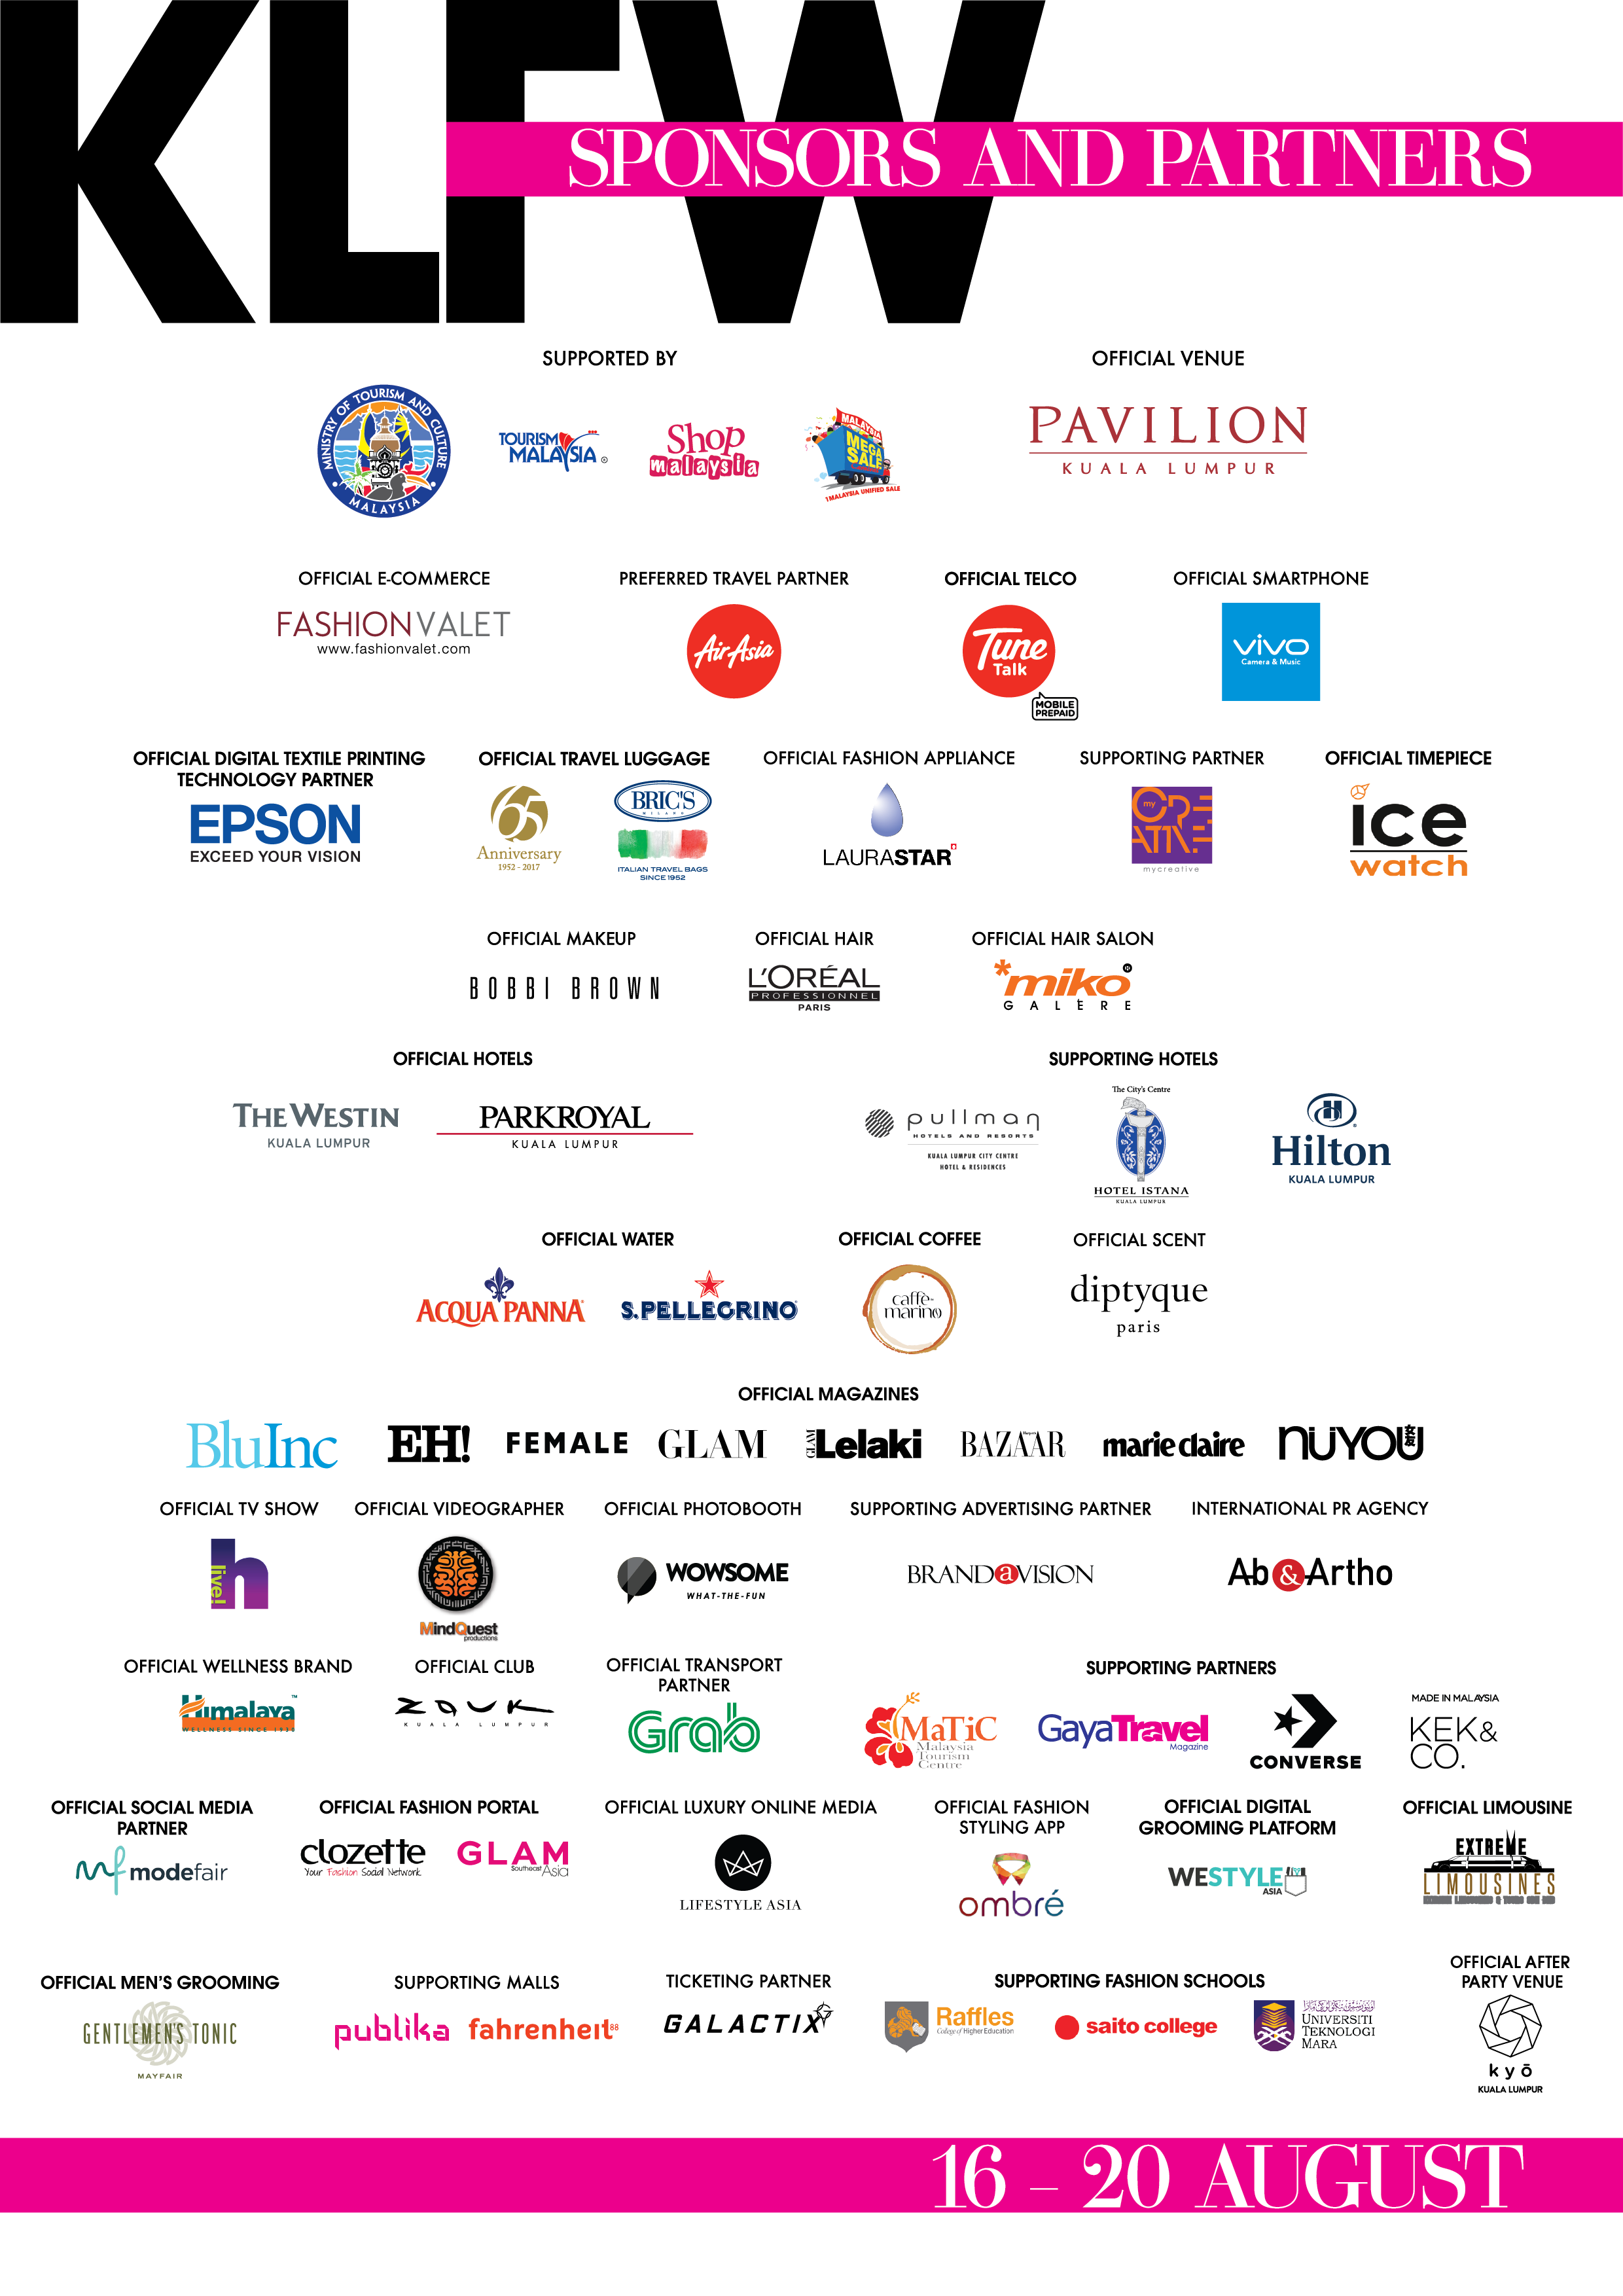 sponsors logo-01.png